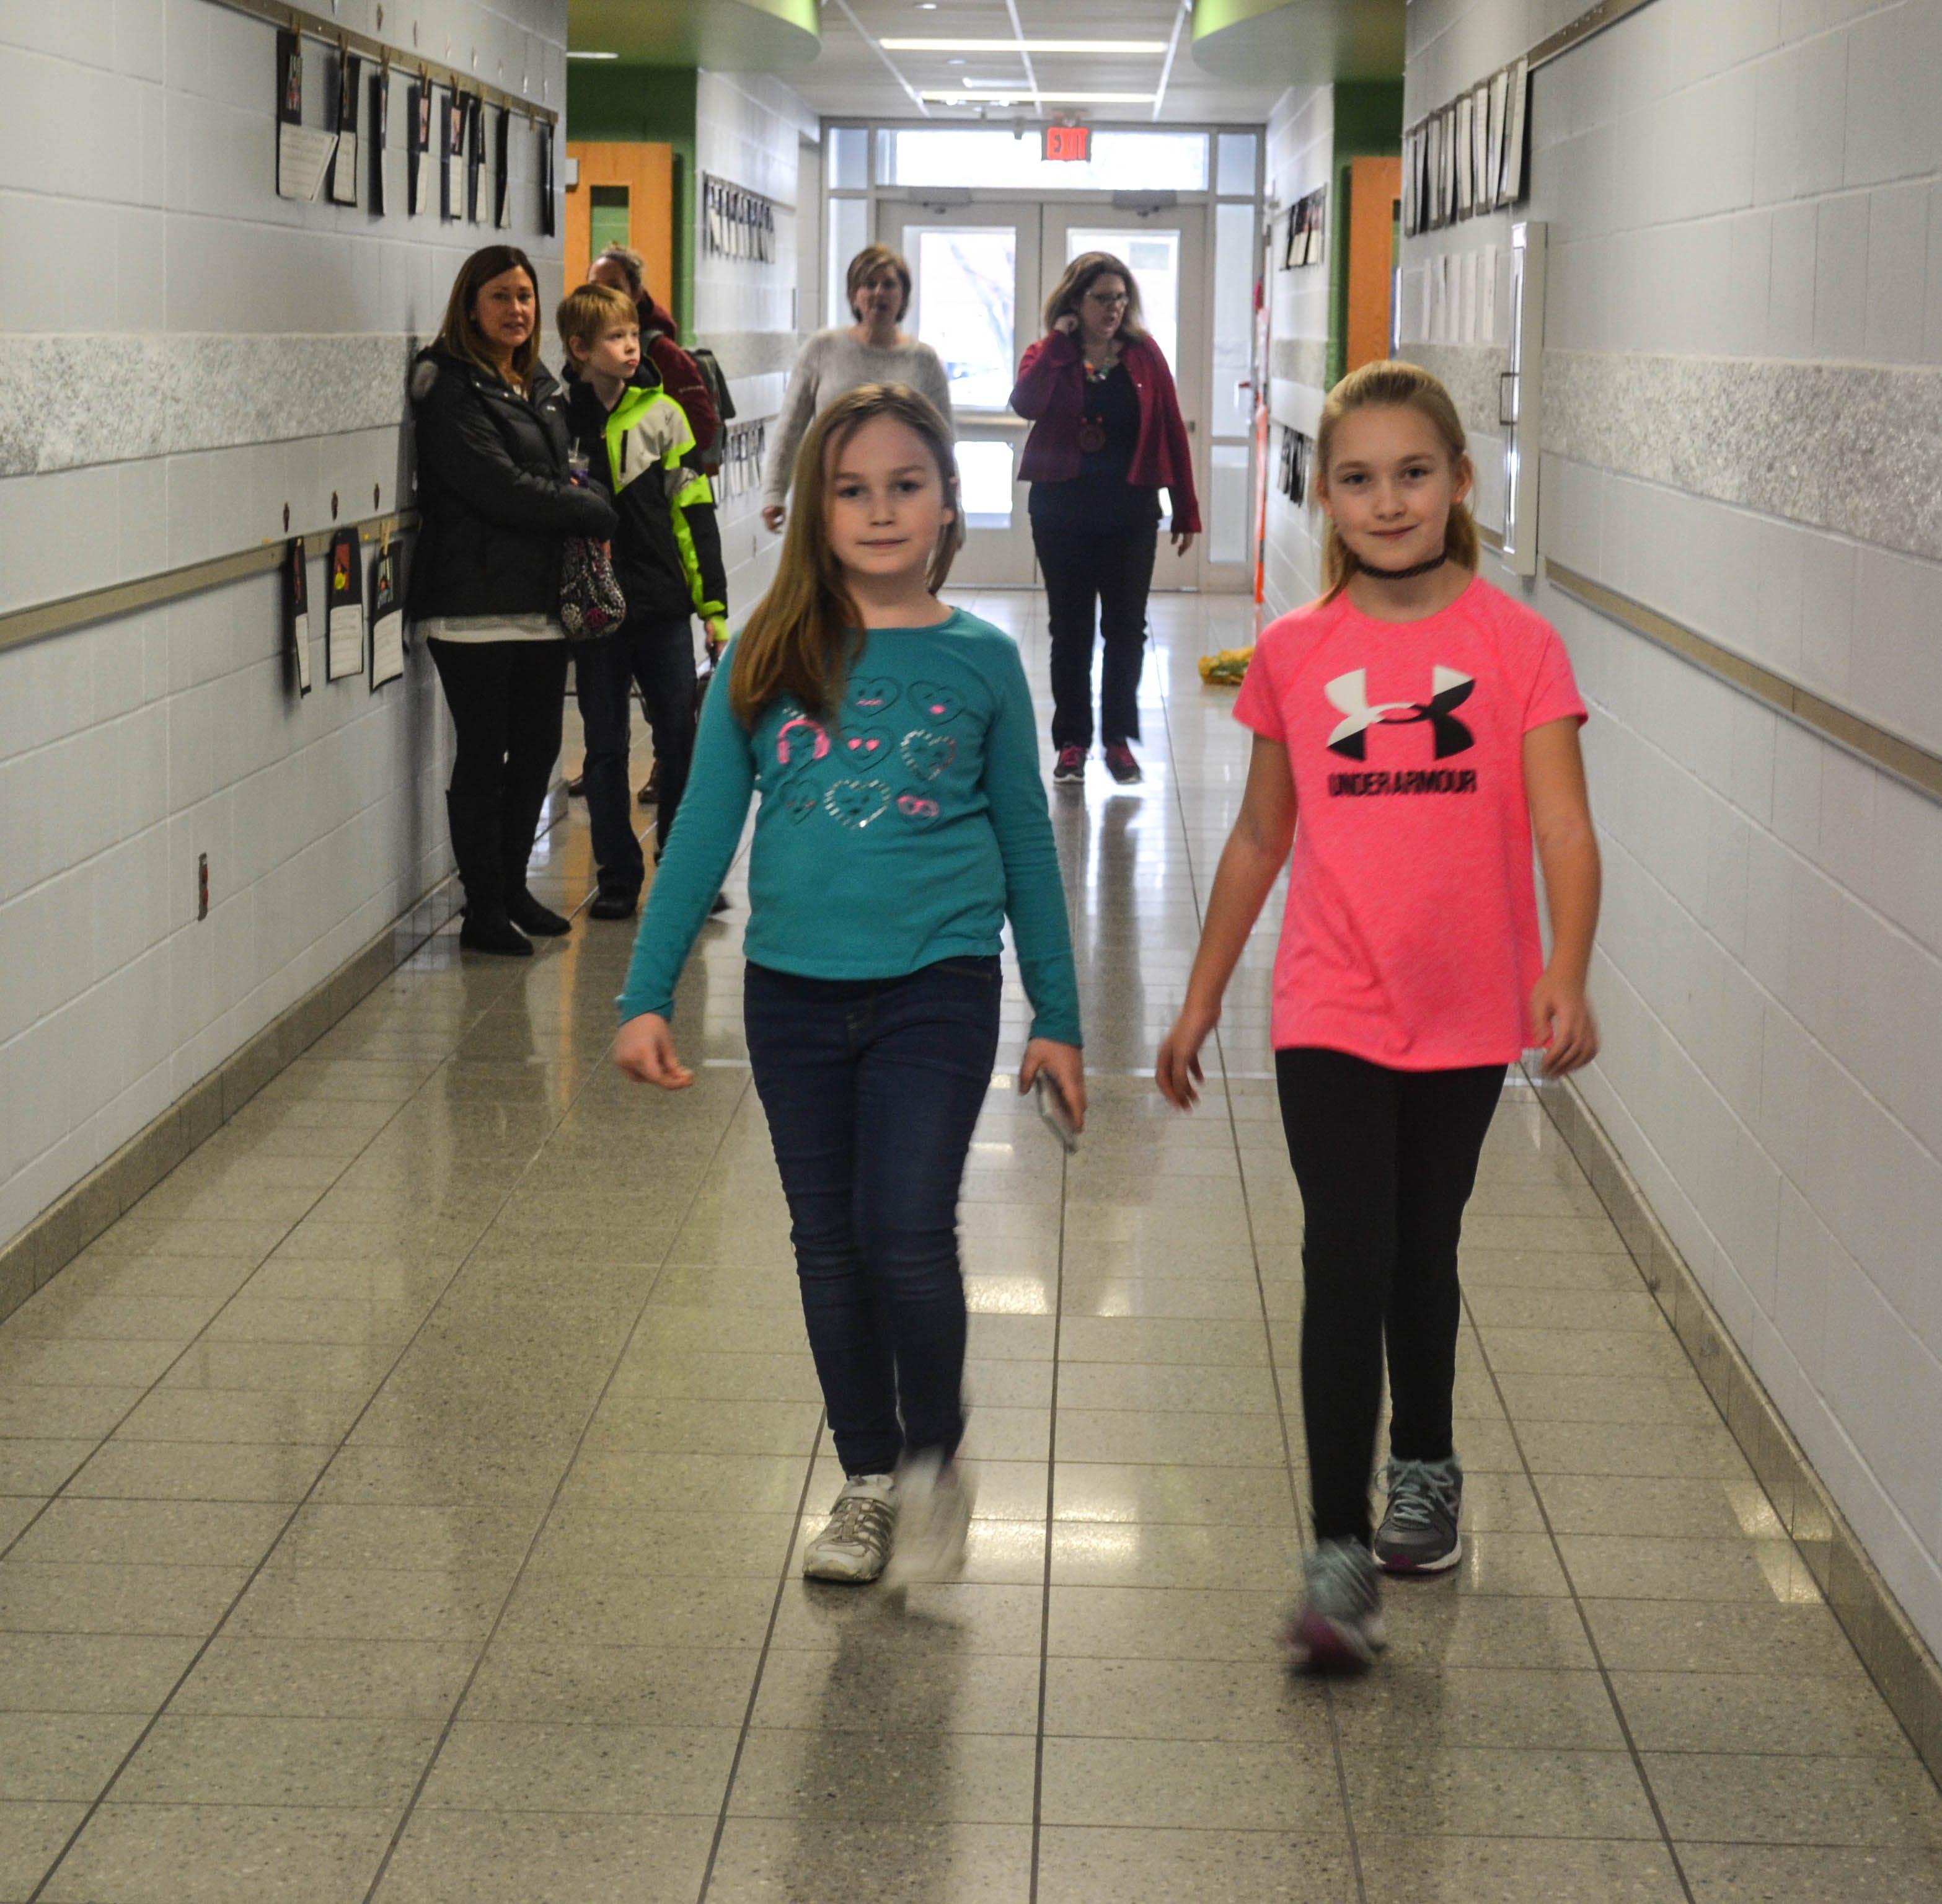 Kids, teachers hoof the halls of Woodmore elementary for Walking Club